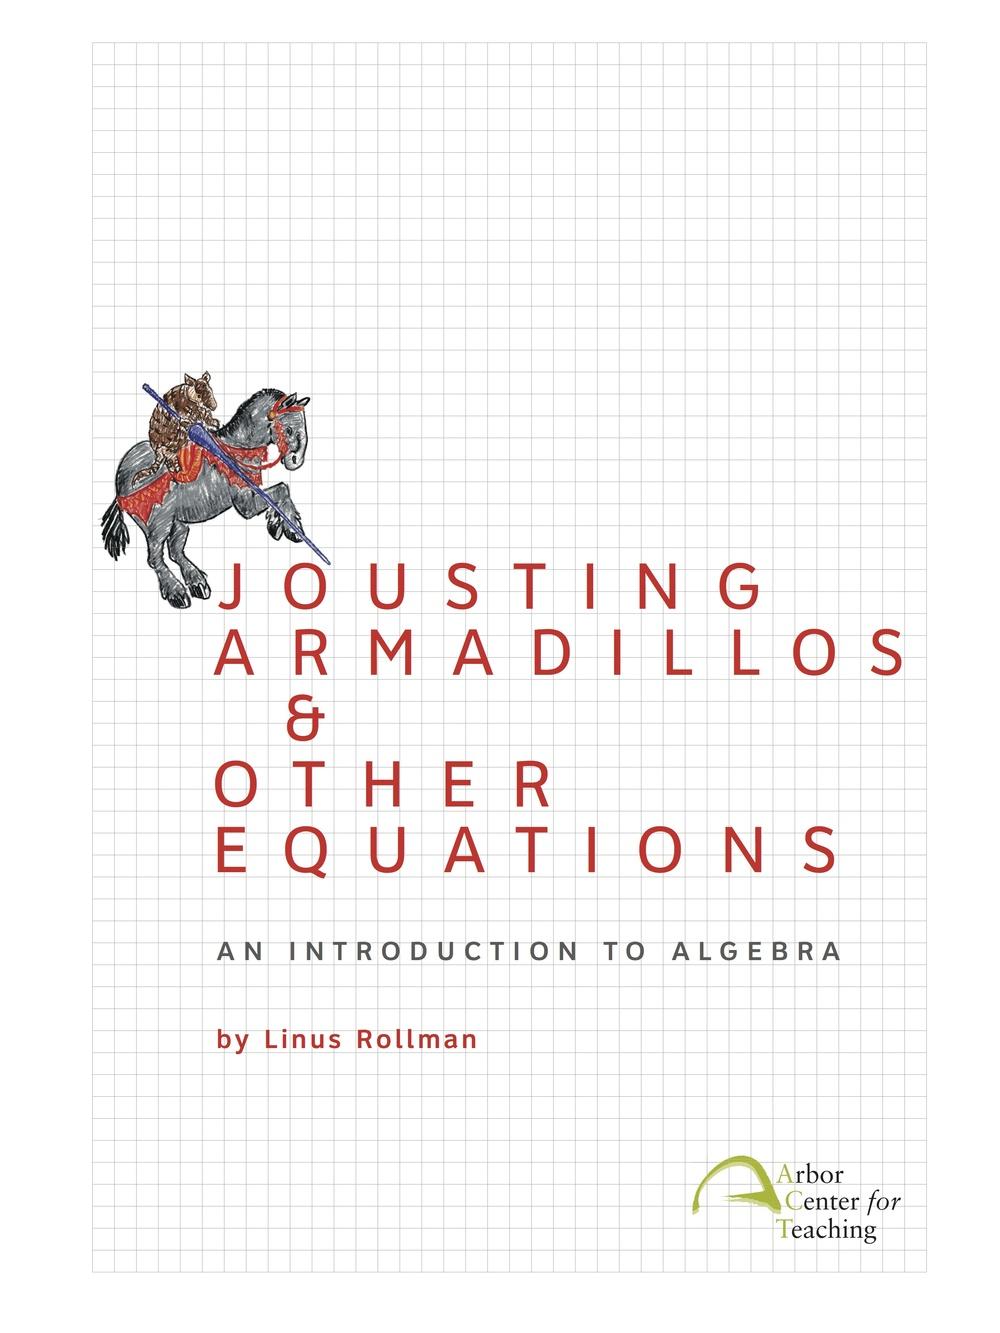 Jousting Armadillos Arbor Center For Teaching